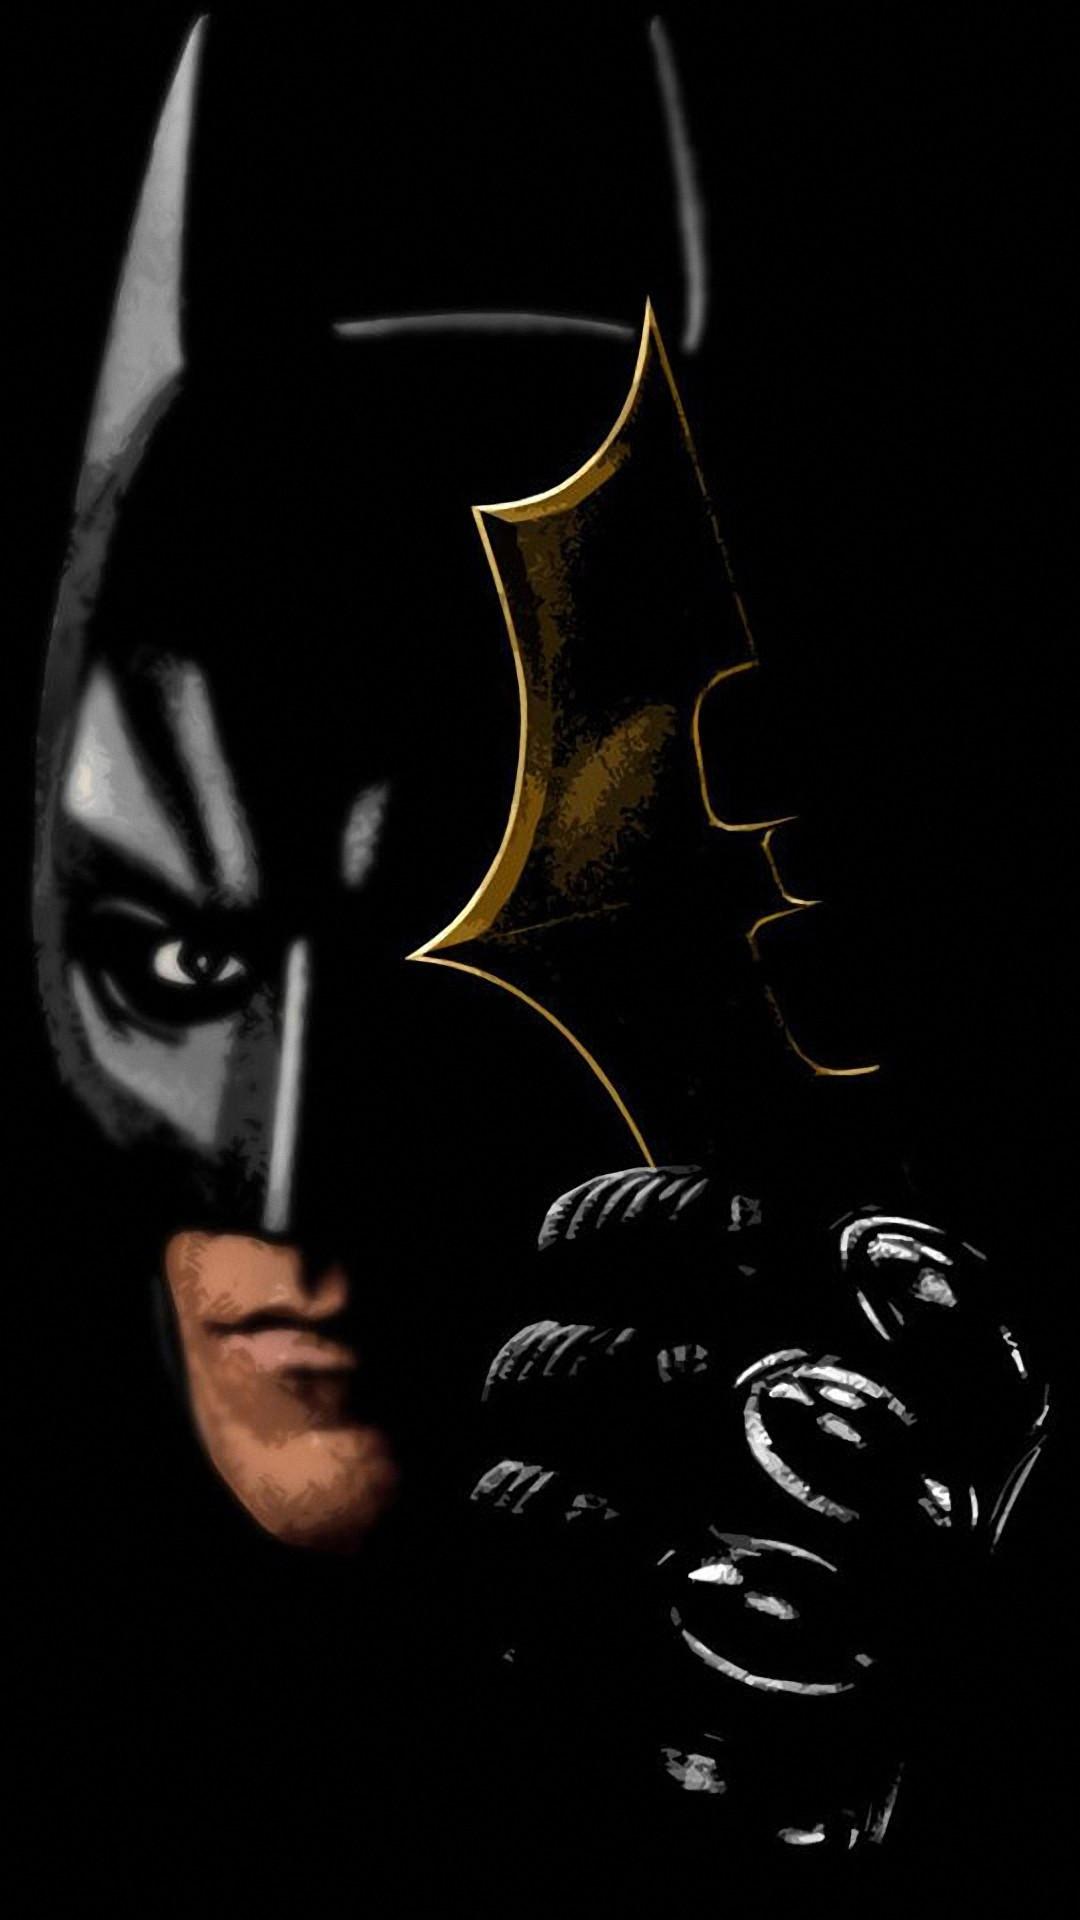 Mobile Phone x Batman Wallpapers HD Desktop Backgrounds